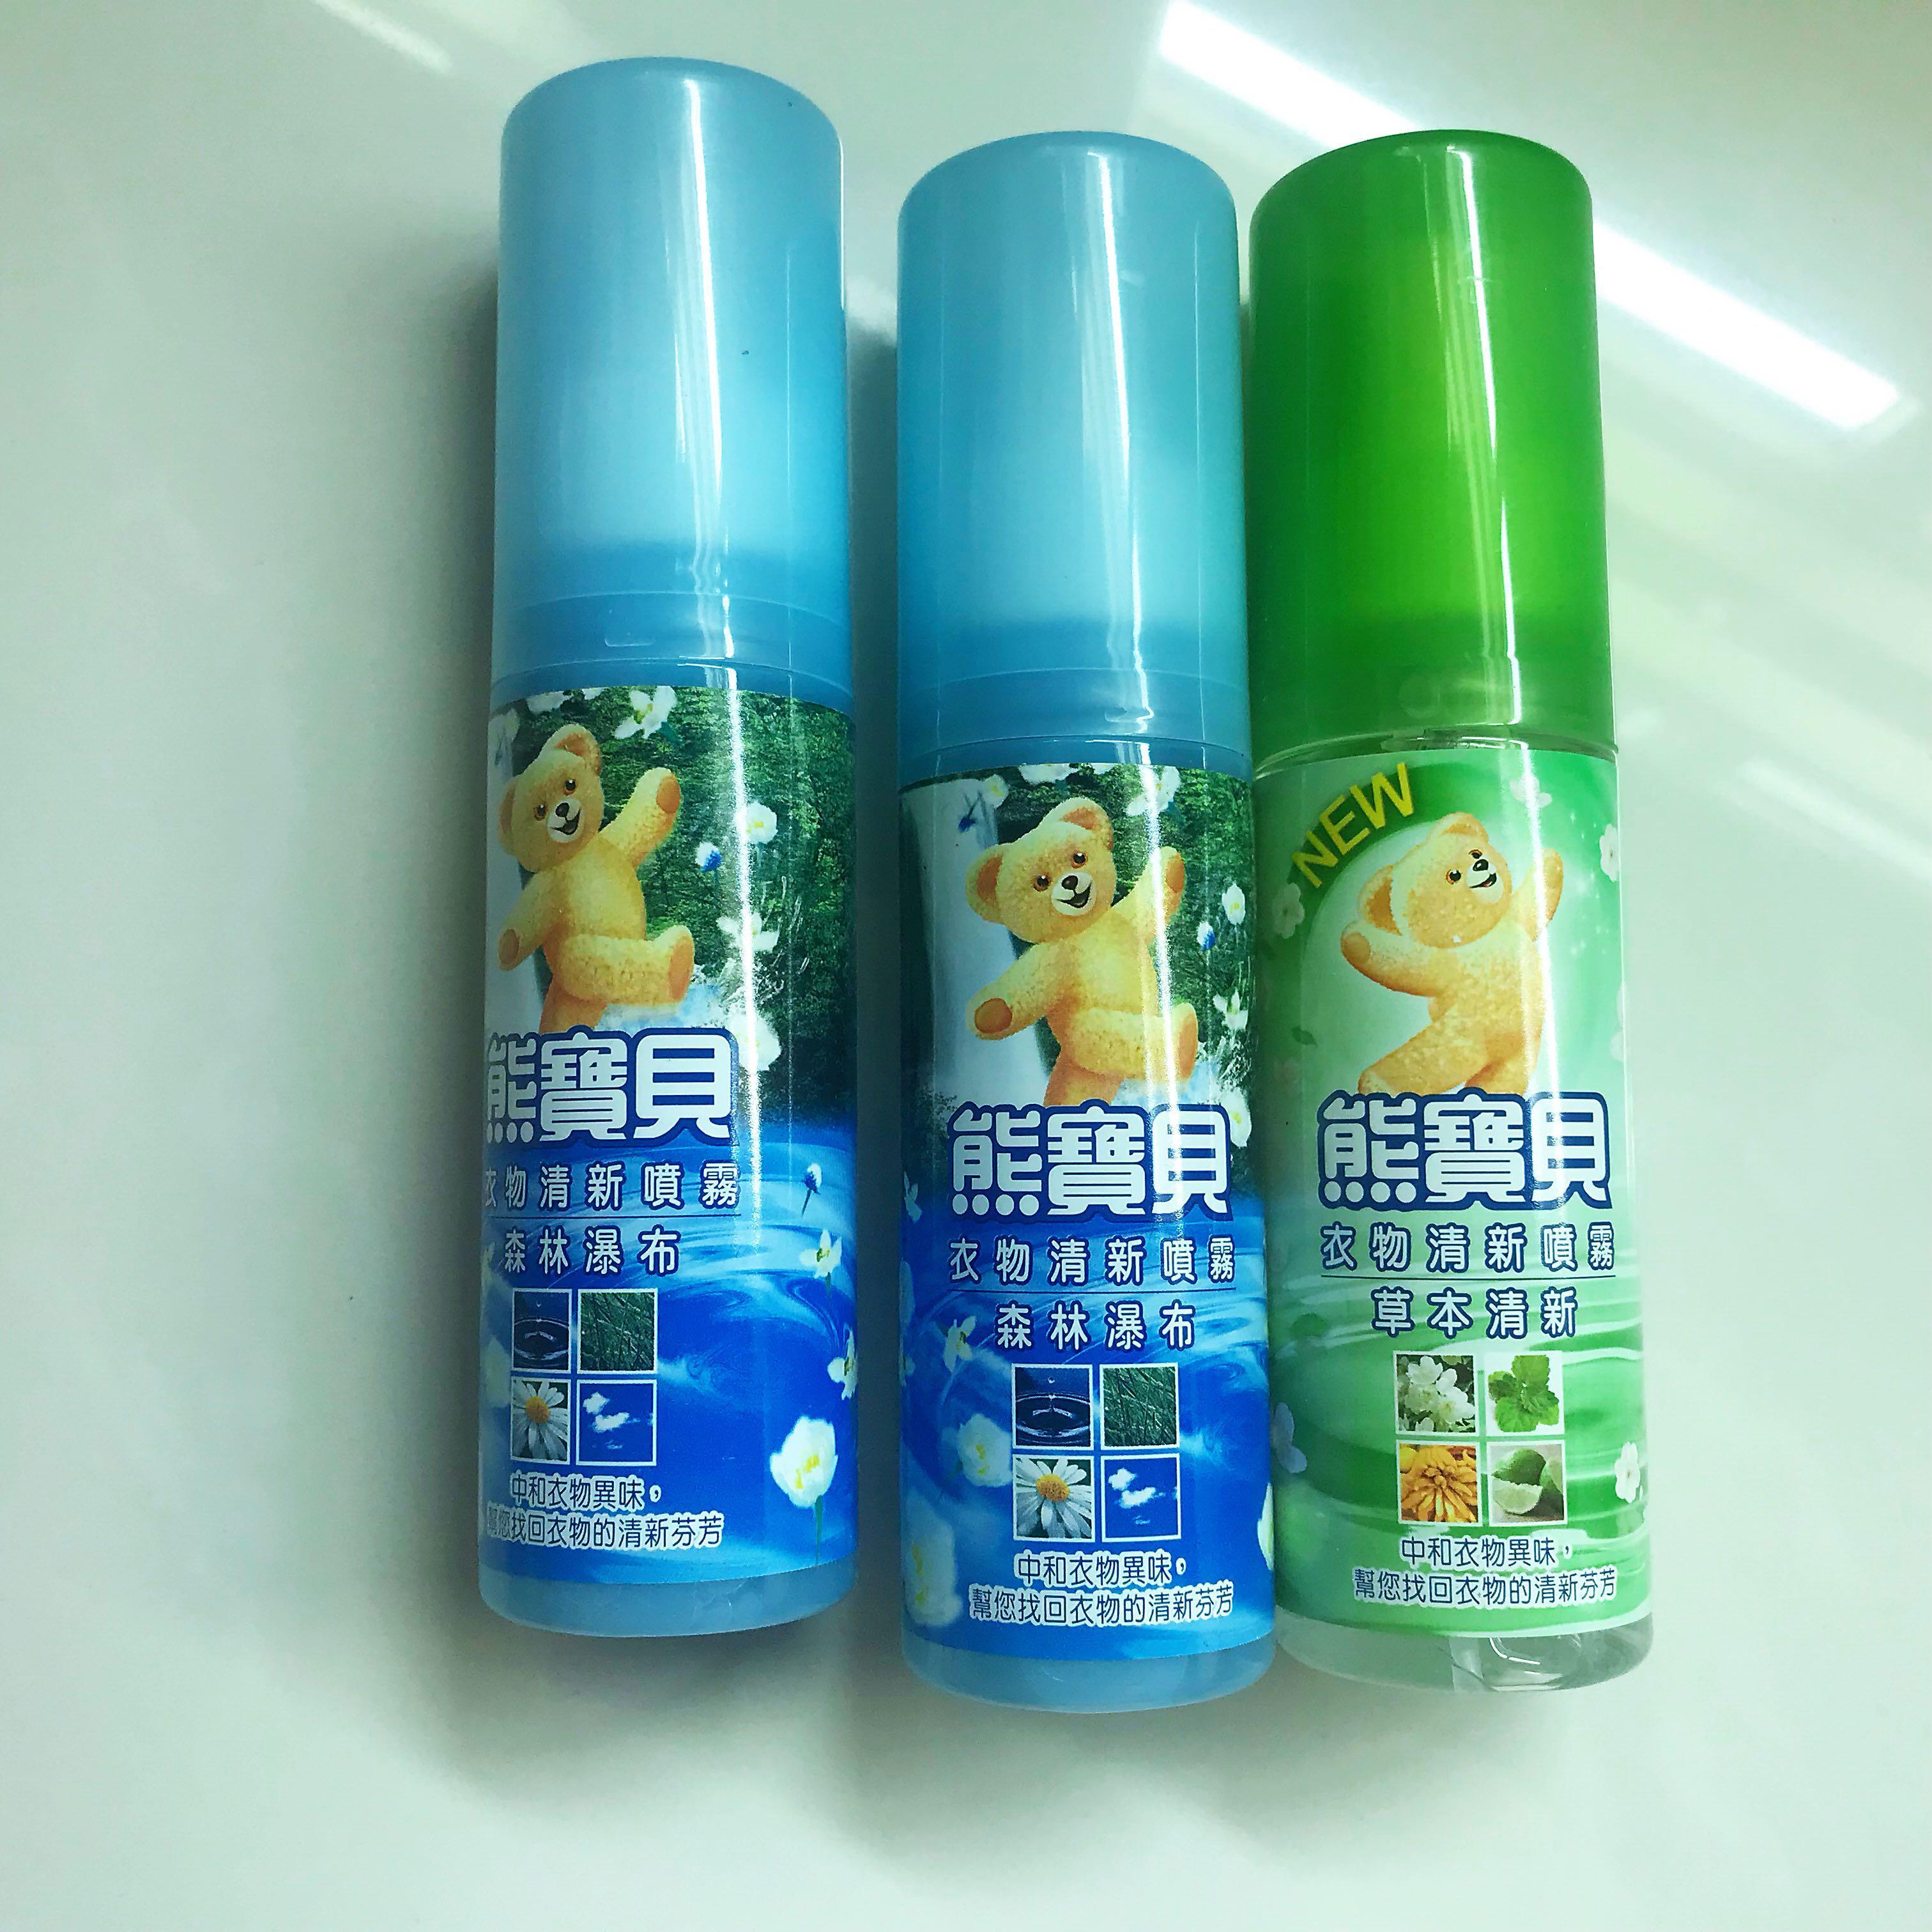 Xiong Bao Bei Fabric Spray